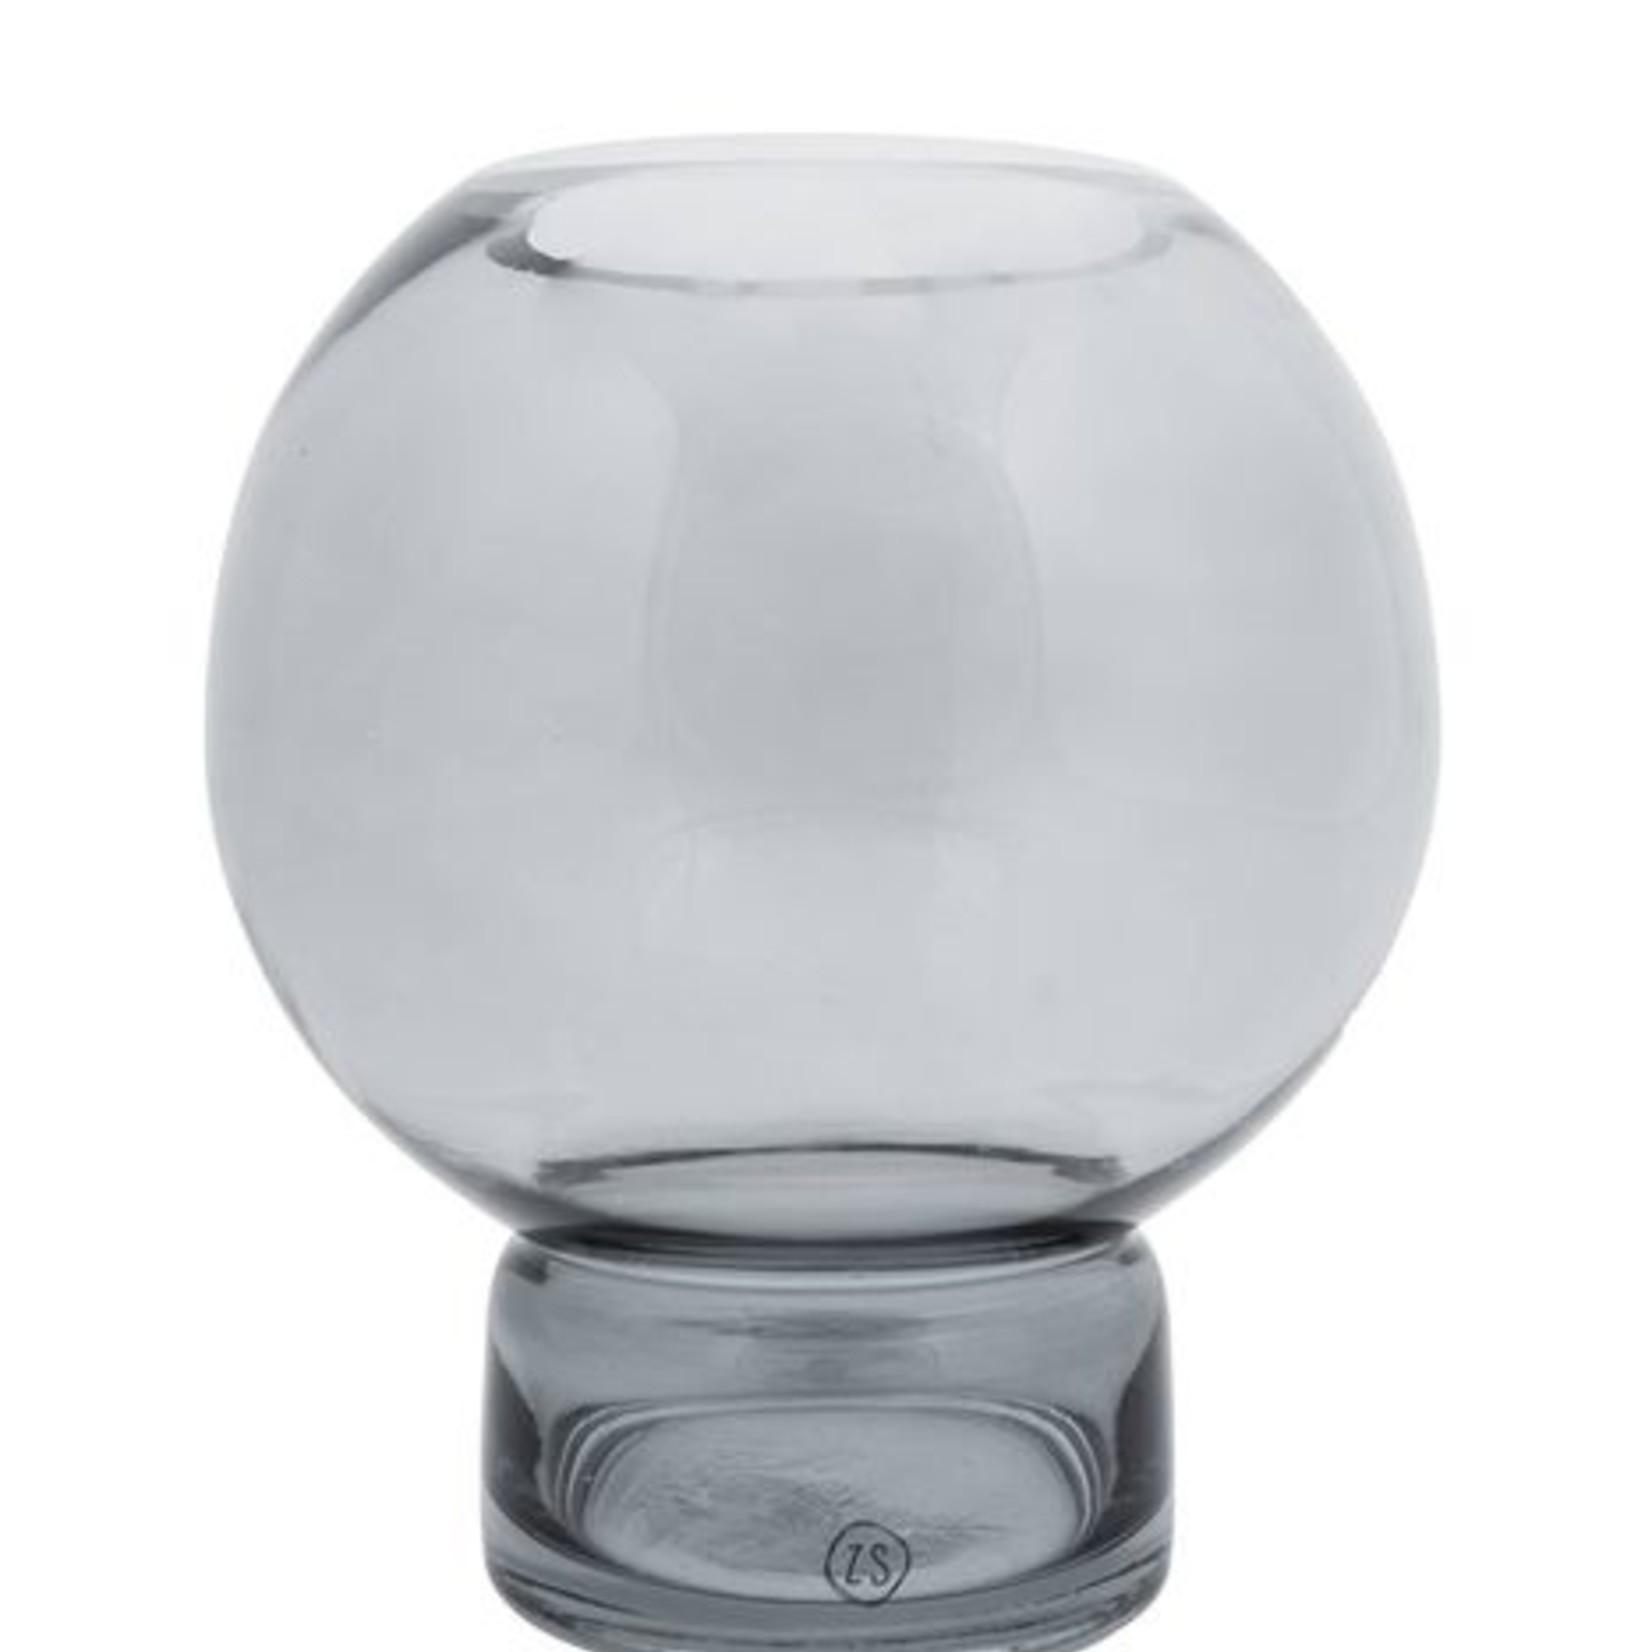 Zusss Bolvaas - Glas - Grafietgrijs - 17x19cm